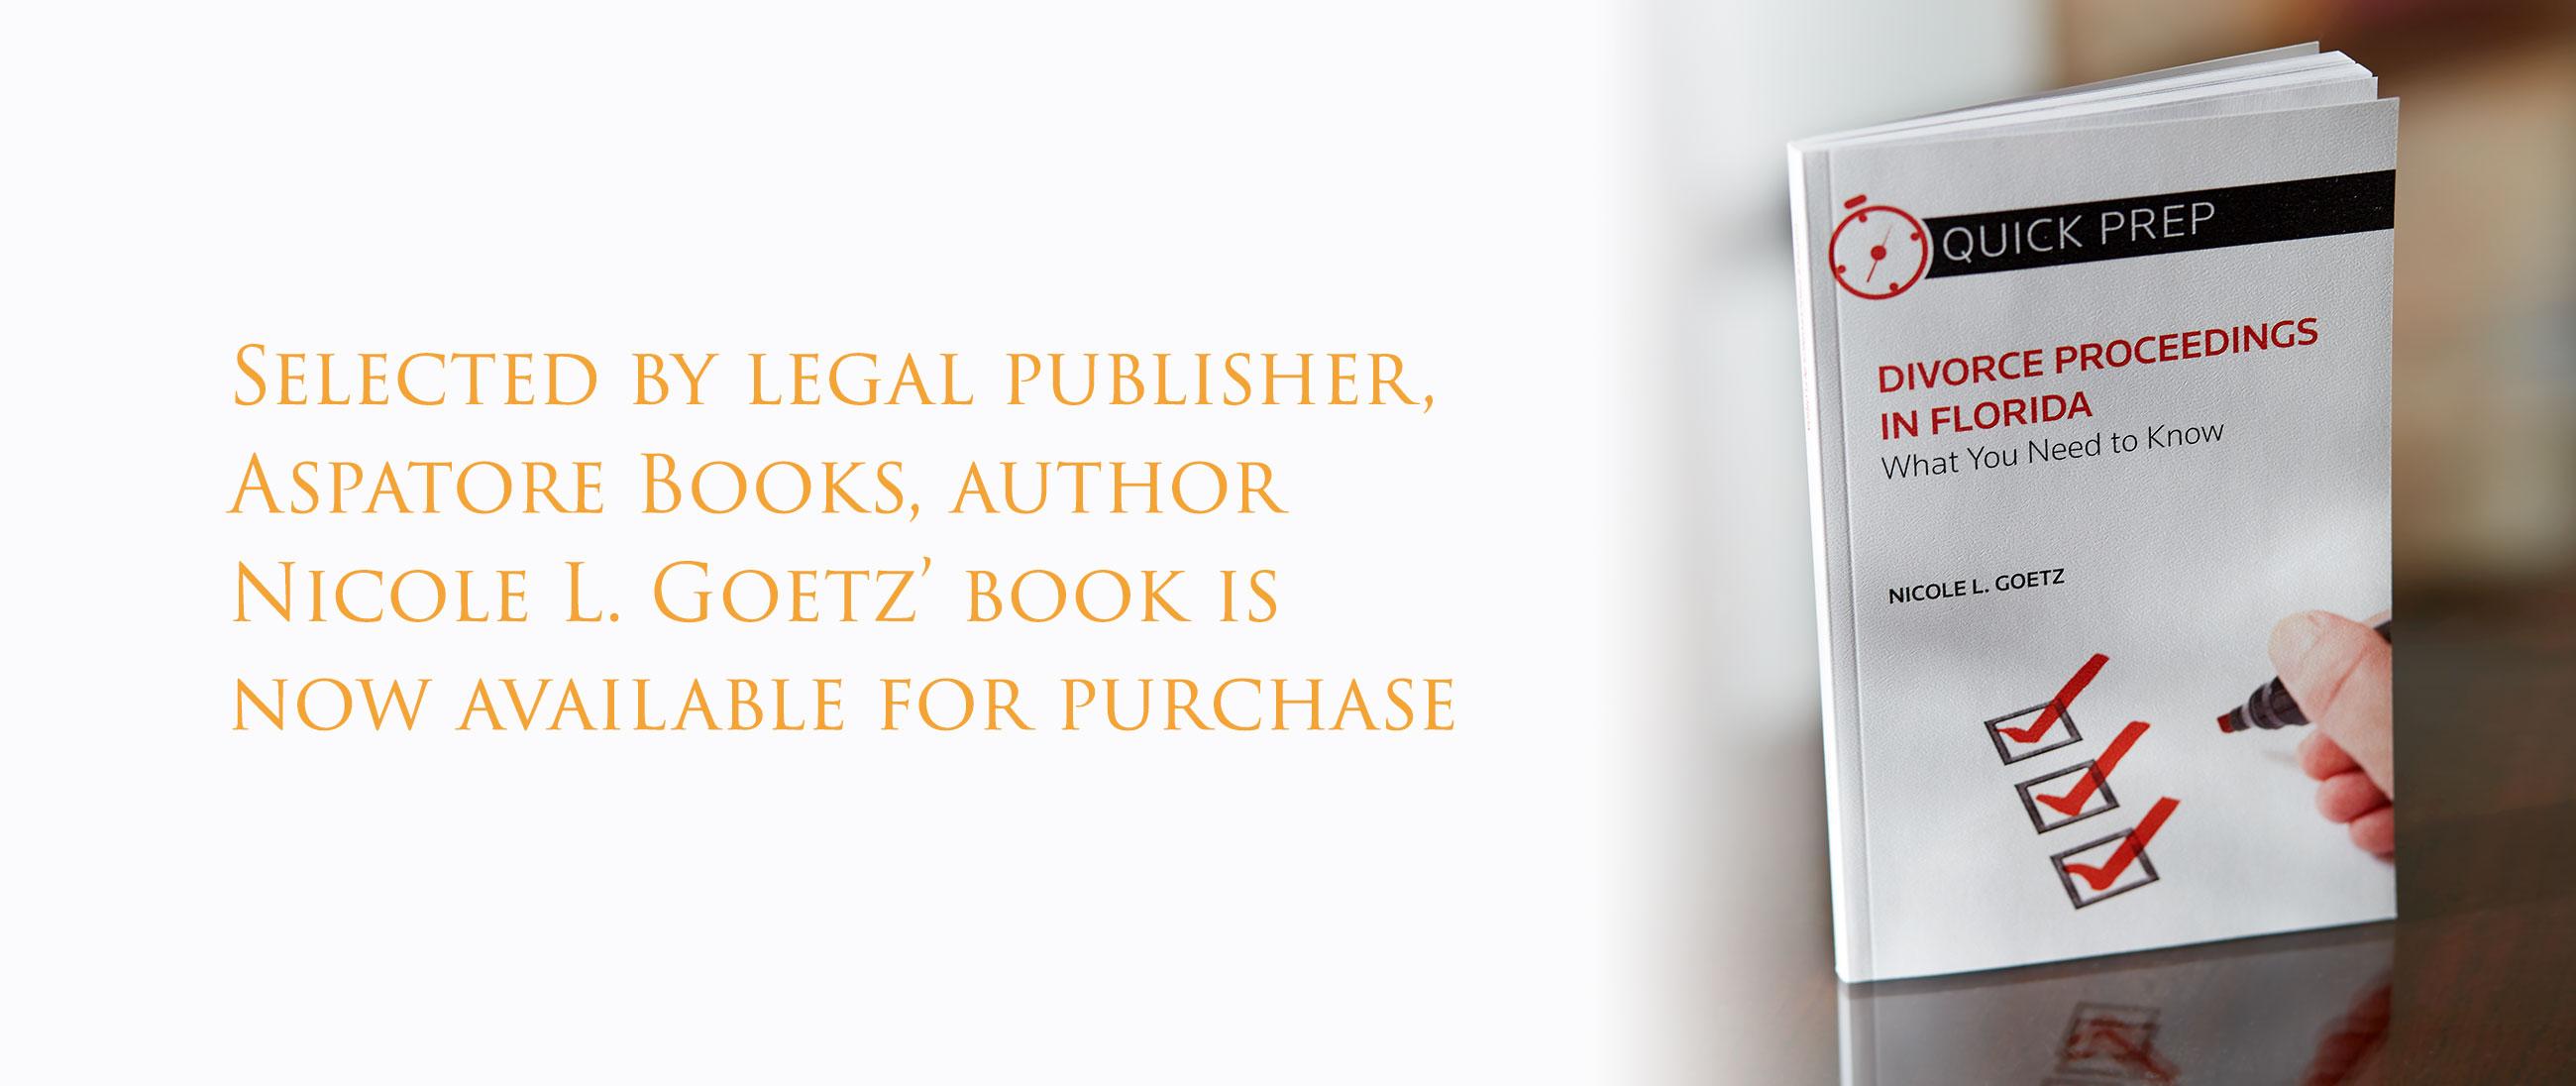 Divorce Proceedings in Florida Book